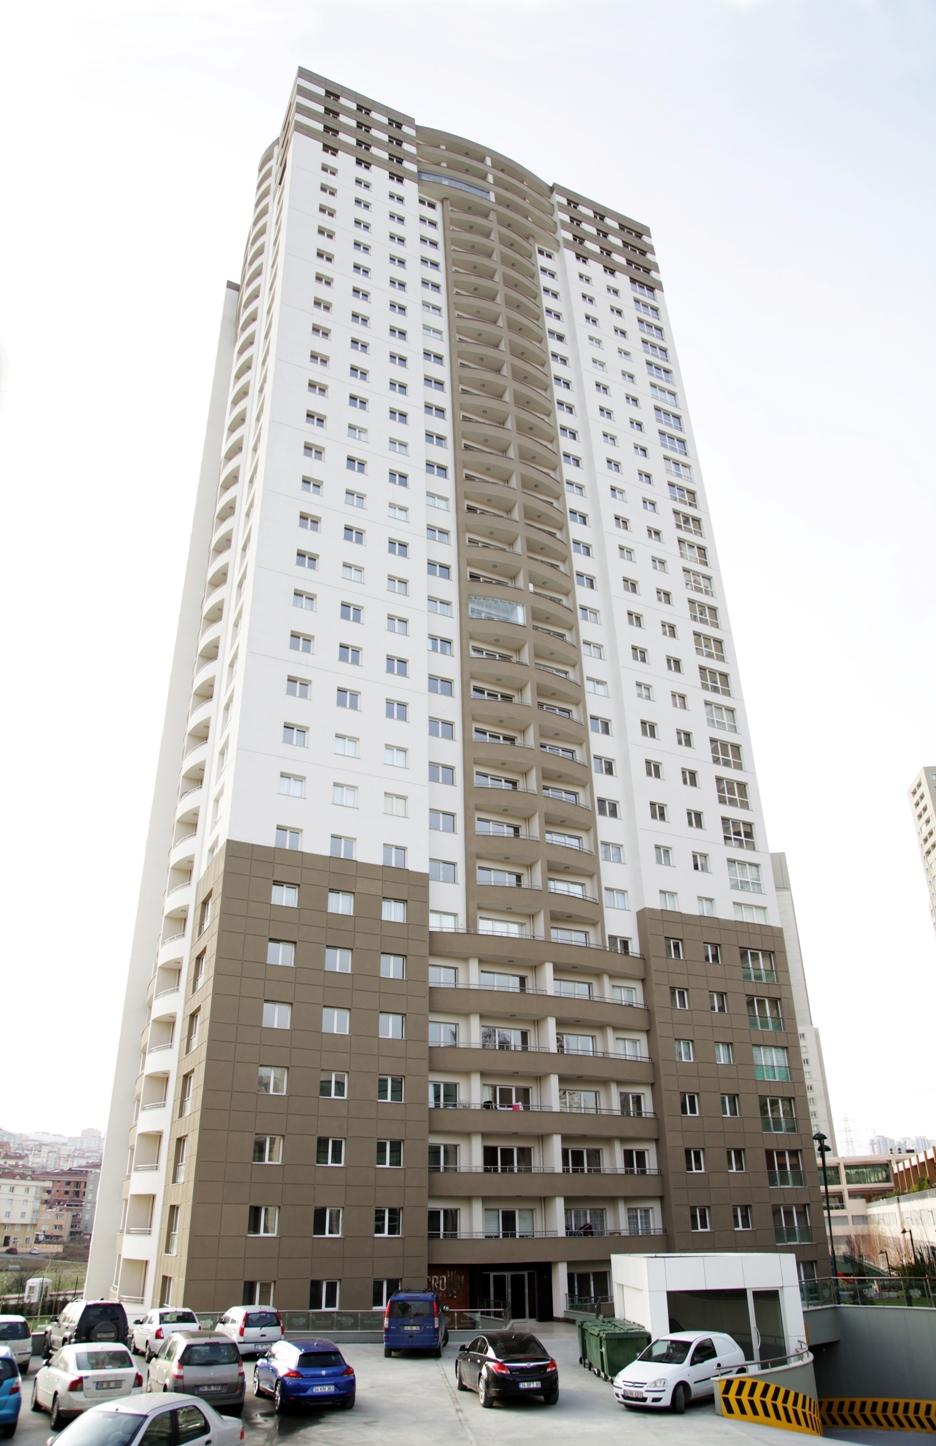 beylikduzu property in istanbul for sale 3